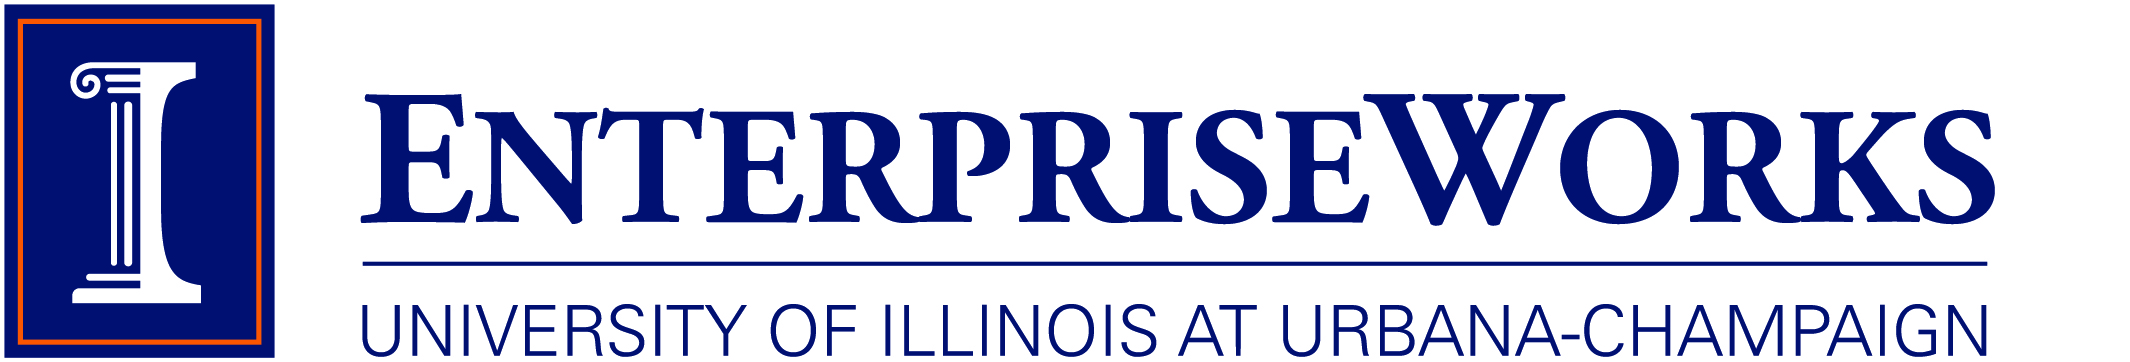 EnterpriseWorks UofI Urbana-Champaign